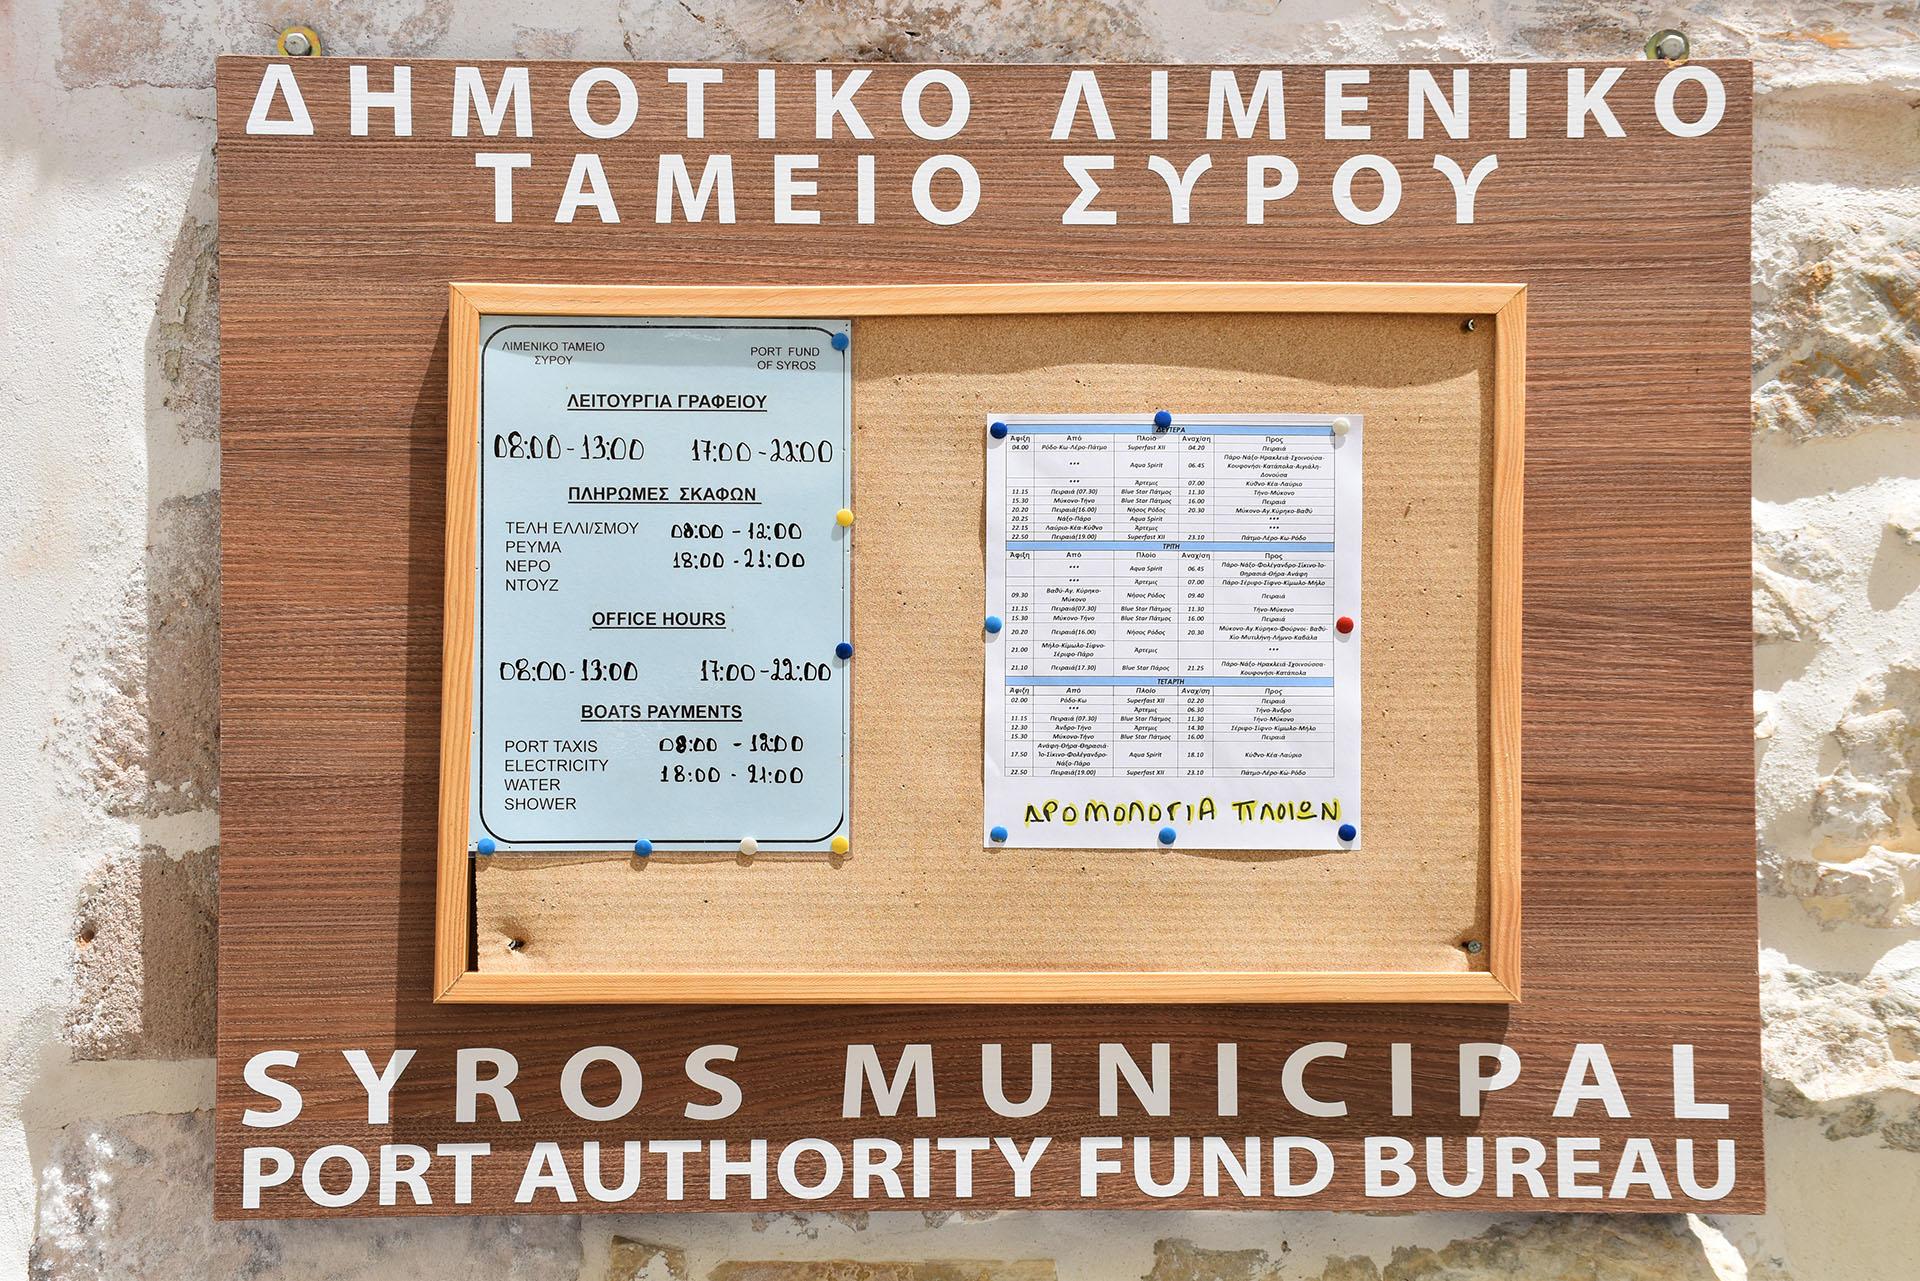 52ce8b222f Κανονισμοί-Τιμολόγια - Δημοτικό Λιμενικό Ταμείο Σύρου